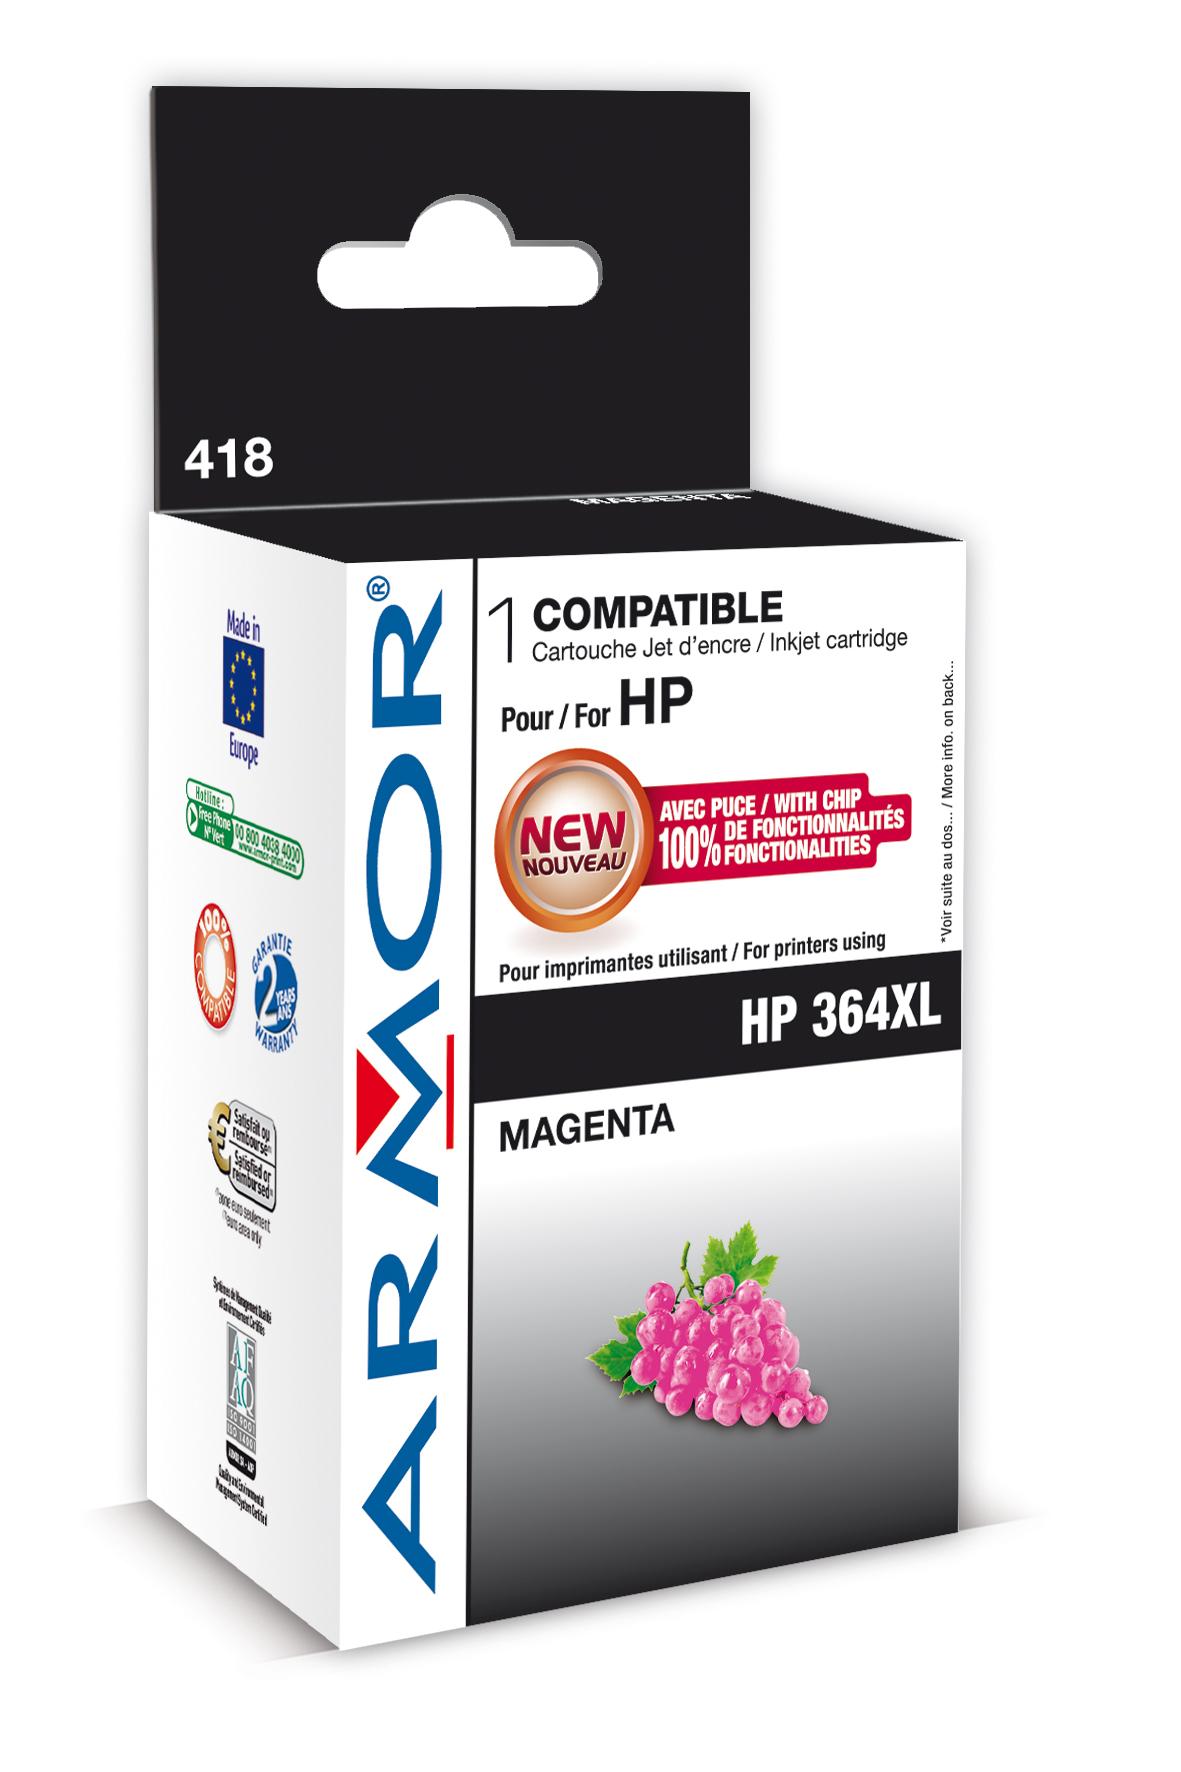 Armor ink-jet pro HP Photosmart B8550,12ml,Magenta